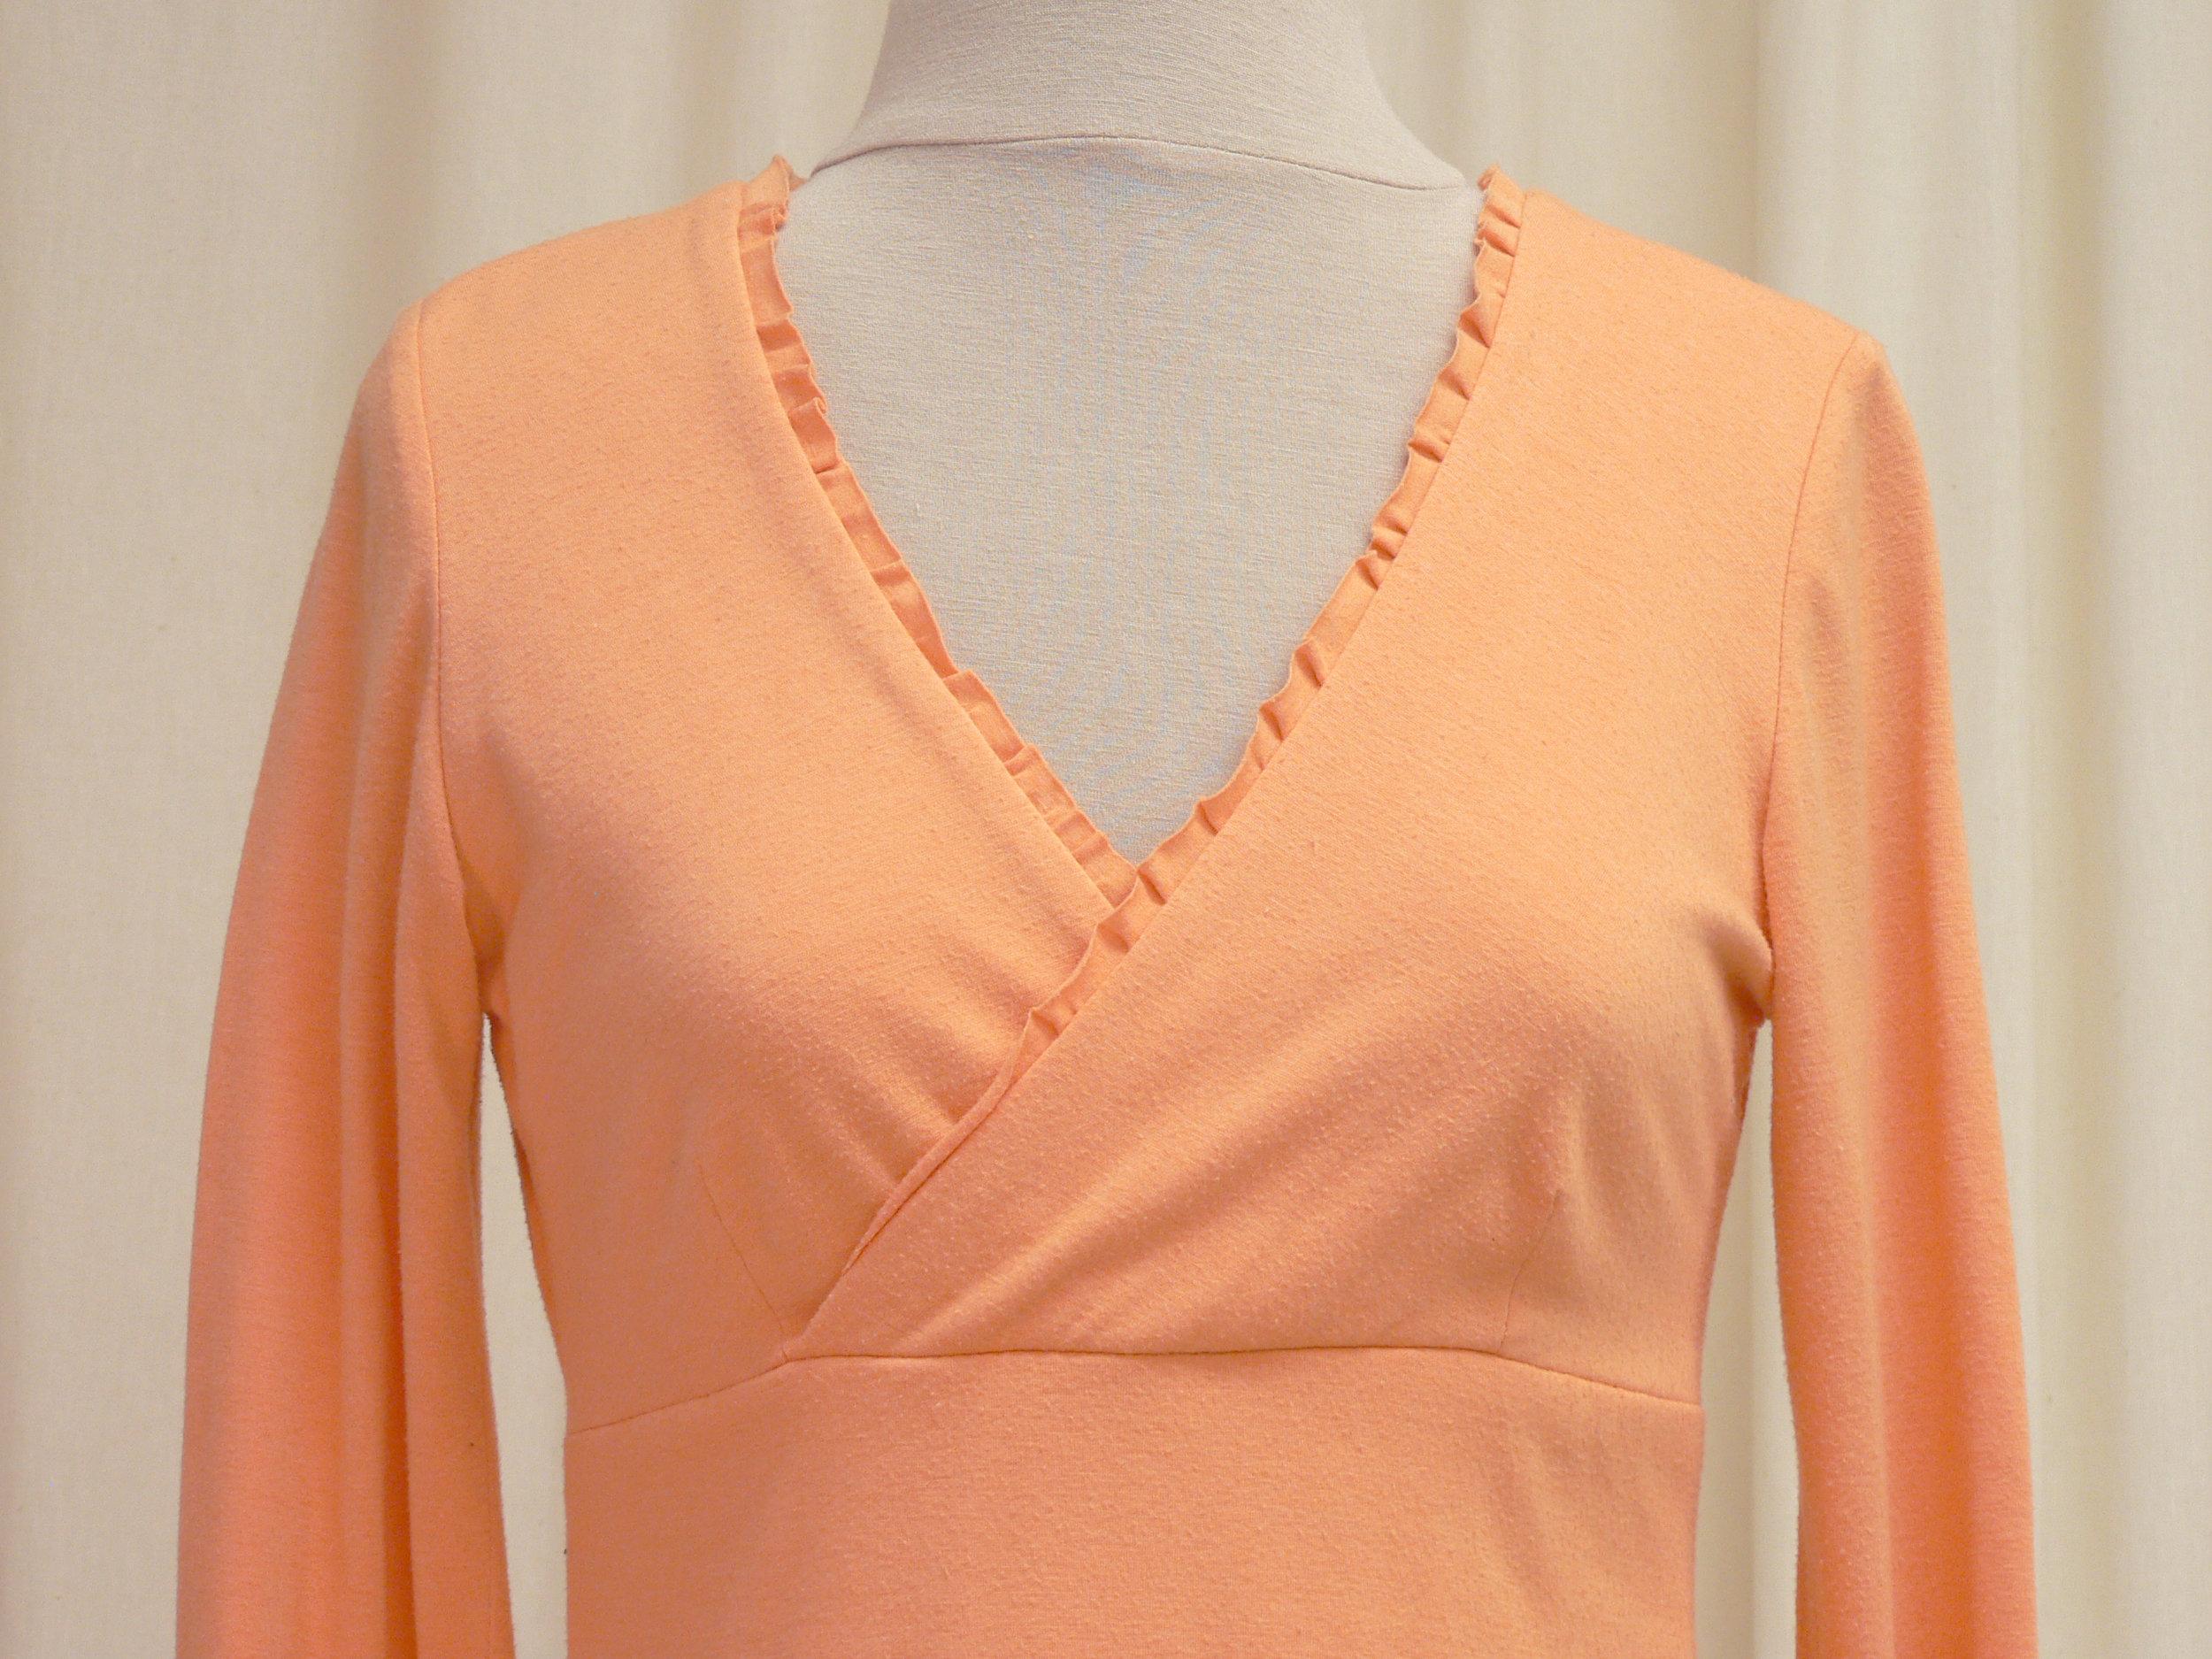 blouse03_front_detail.jpg